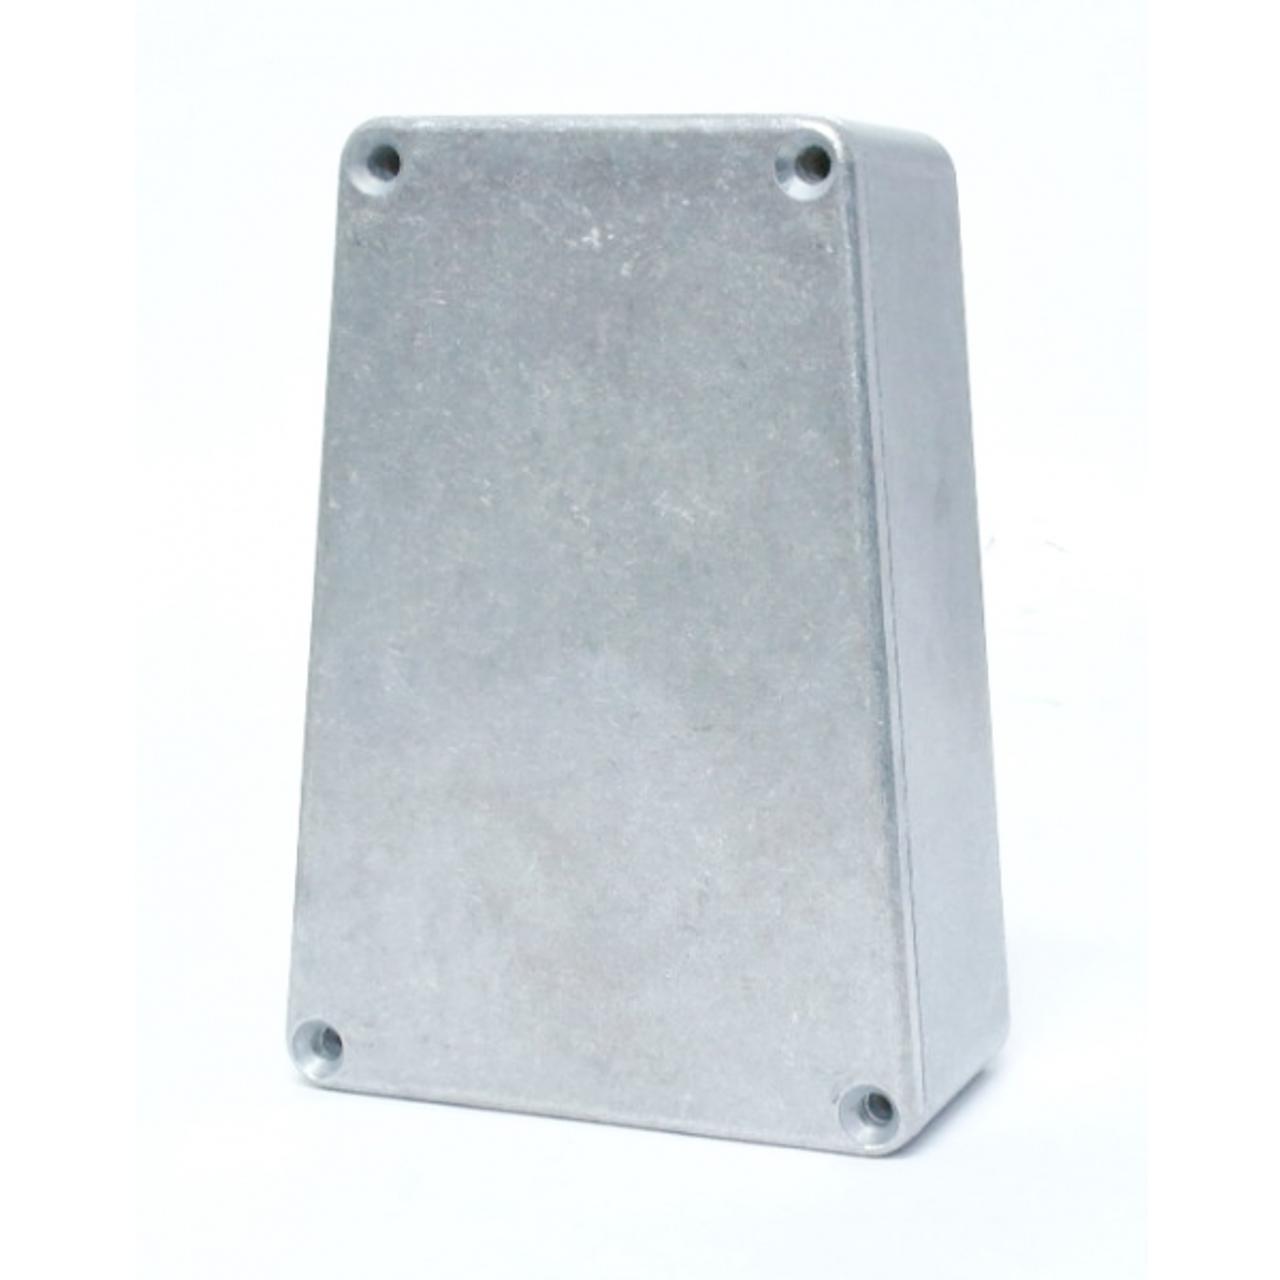 Hammond 1590TRPB - Short Trapezoid Pedal Enclosure